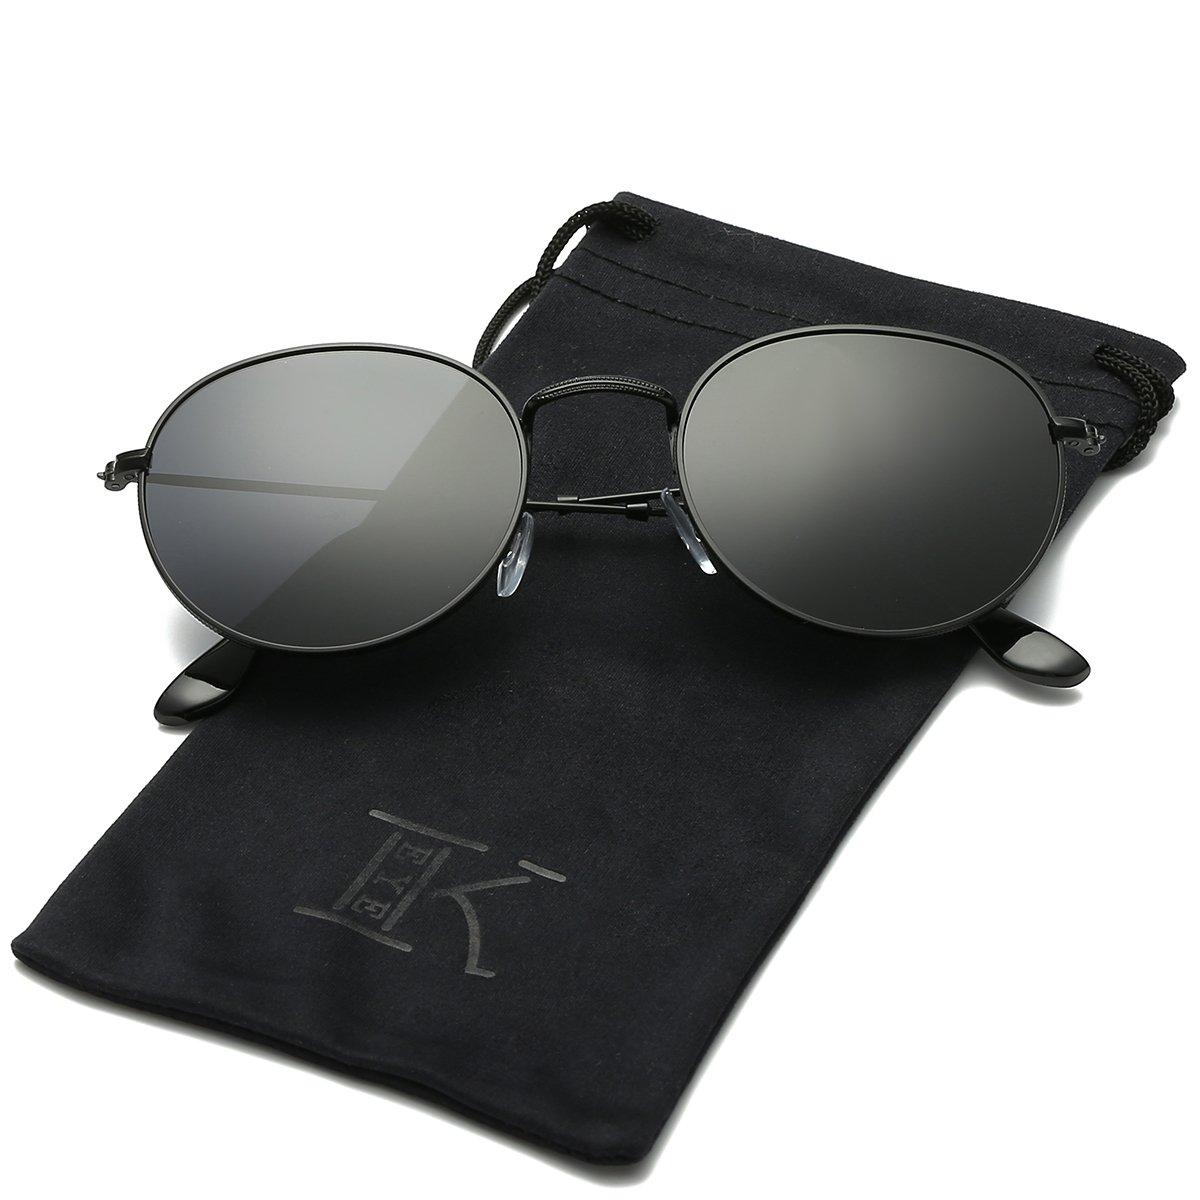 ada7b86be3d0 Amazon.com  LKEYE Small Unisex Classic Vintage Round Mirror Lens Polarized  Sunglasses LK1702 3447 Black Frame Gray Lens  Clothing